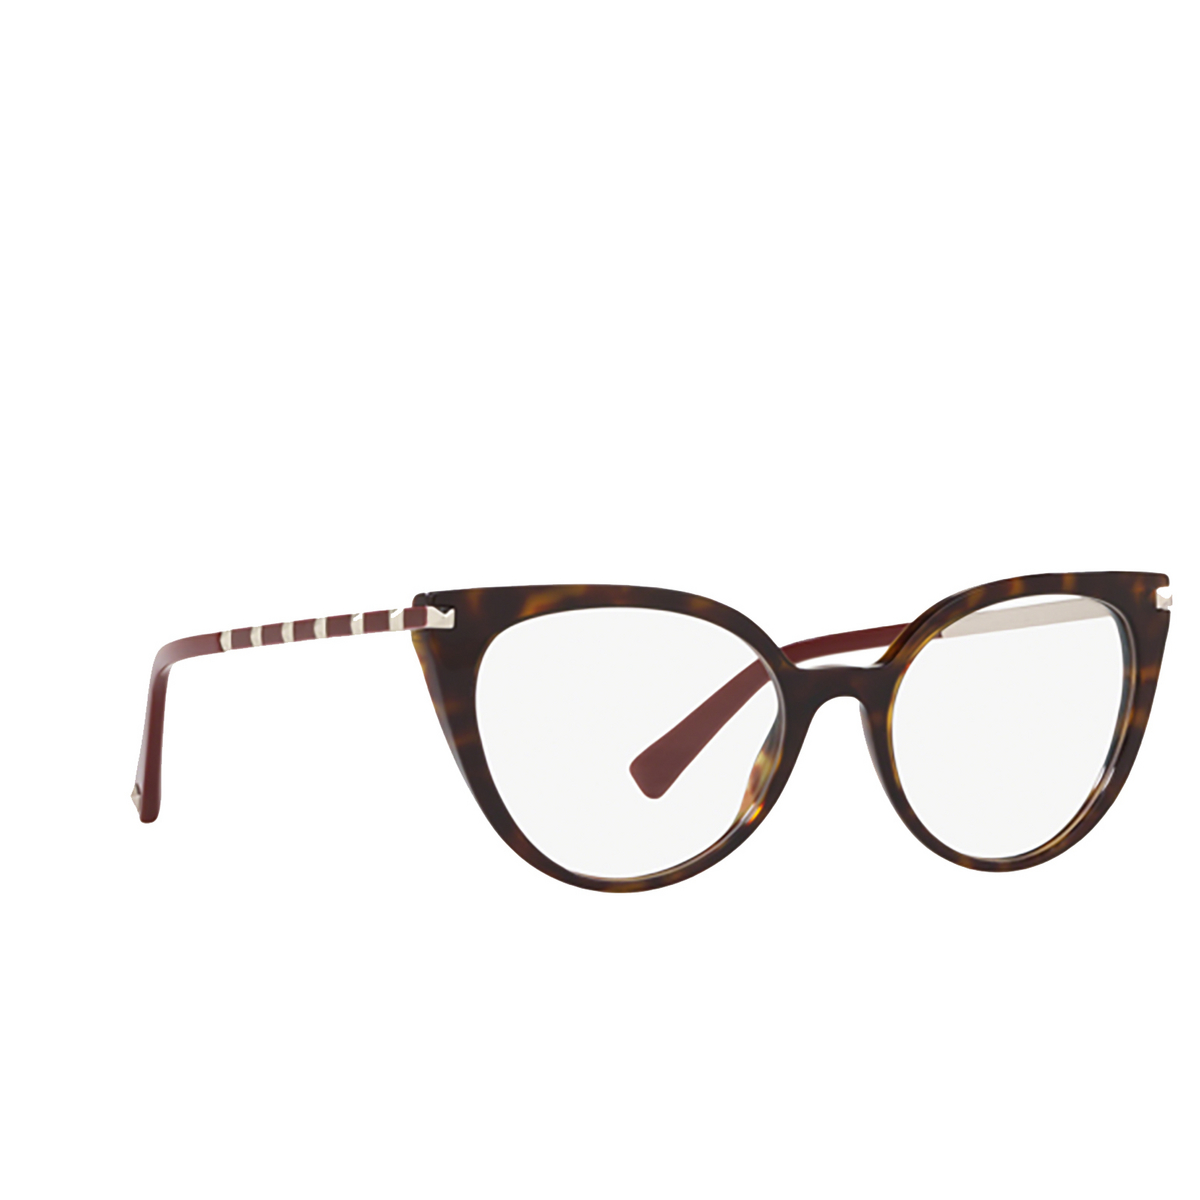 Valentino® Cat-eye Eyeglasses: VA3040 color Havana 5002 - three-quarters view.